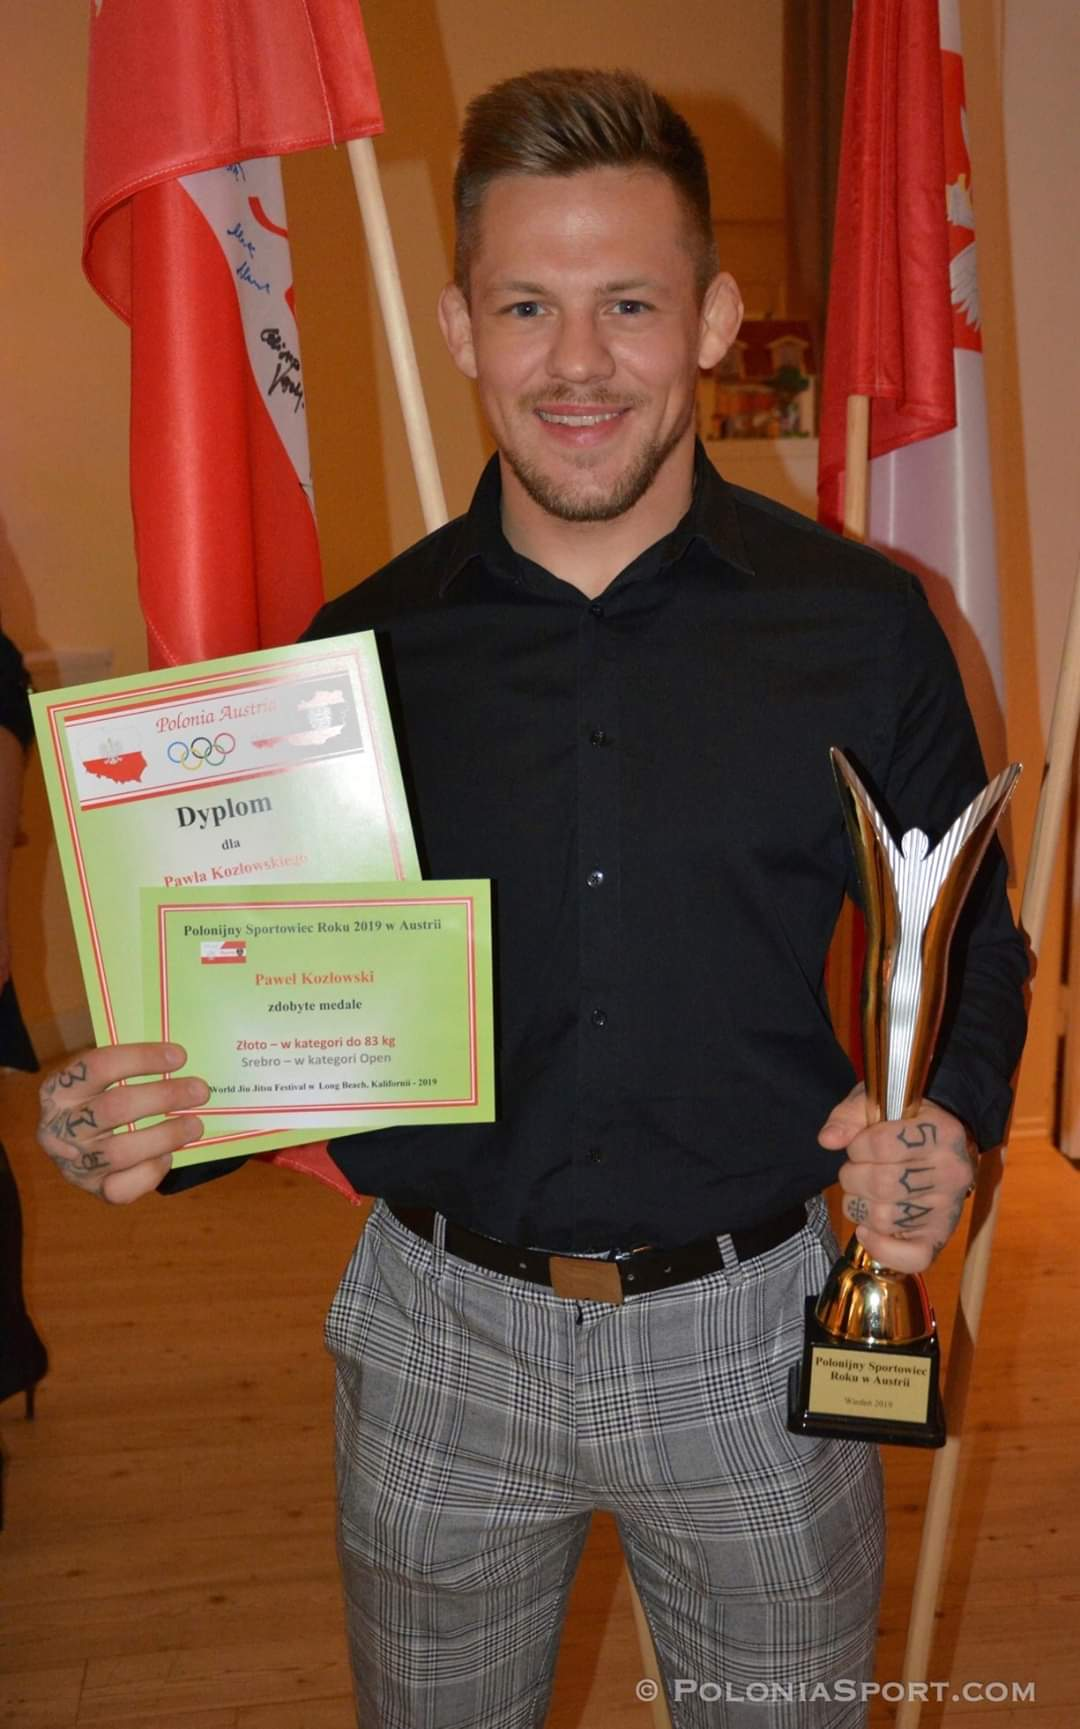 Interview with award winning mixed martial artist Pawel Kozlowski